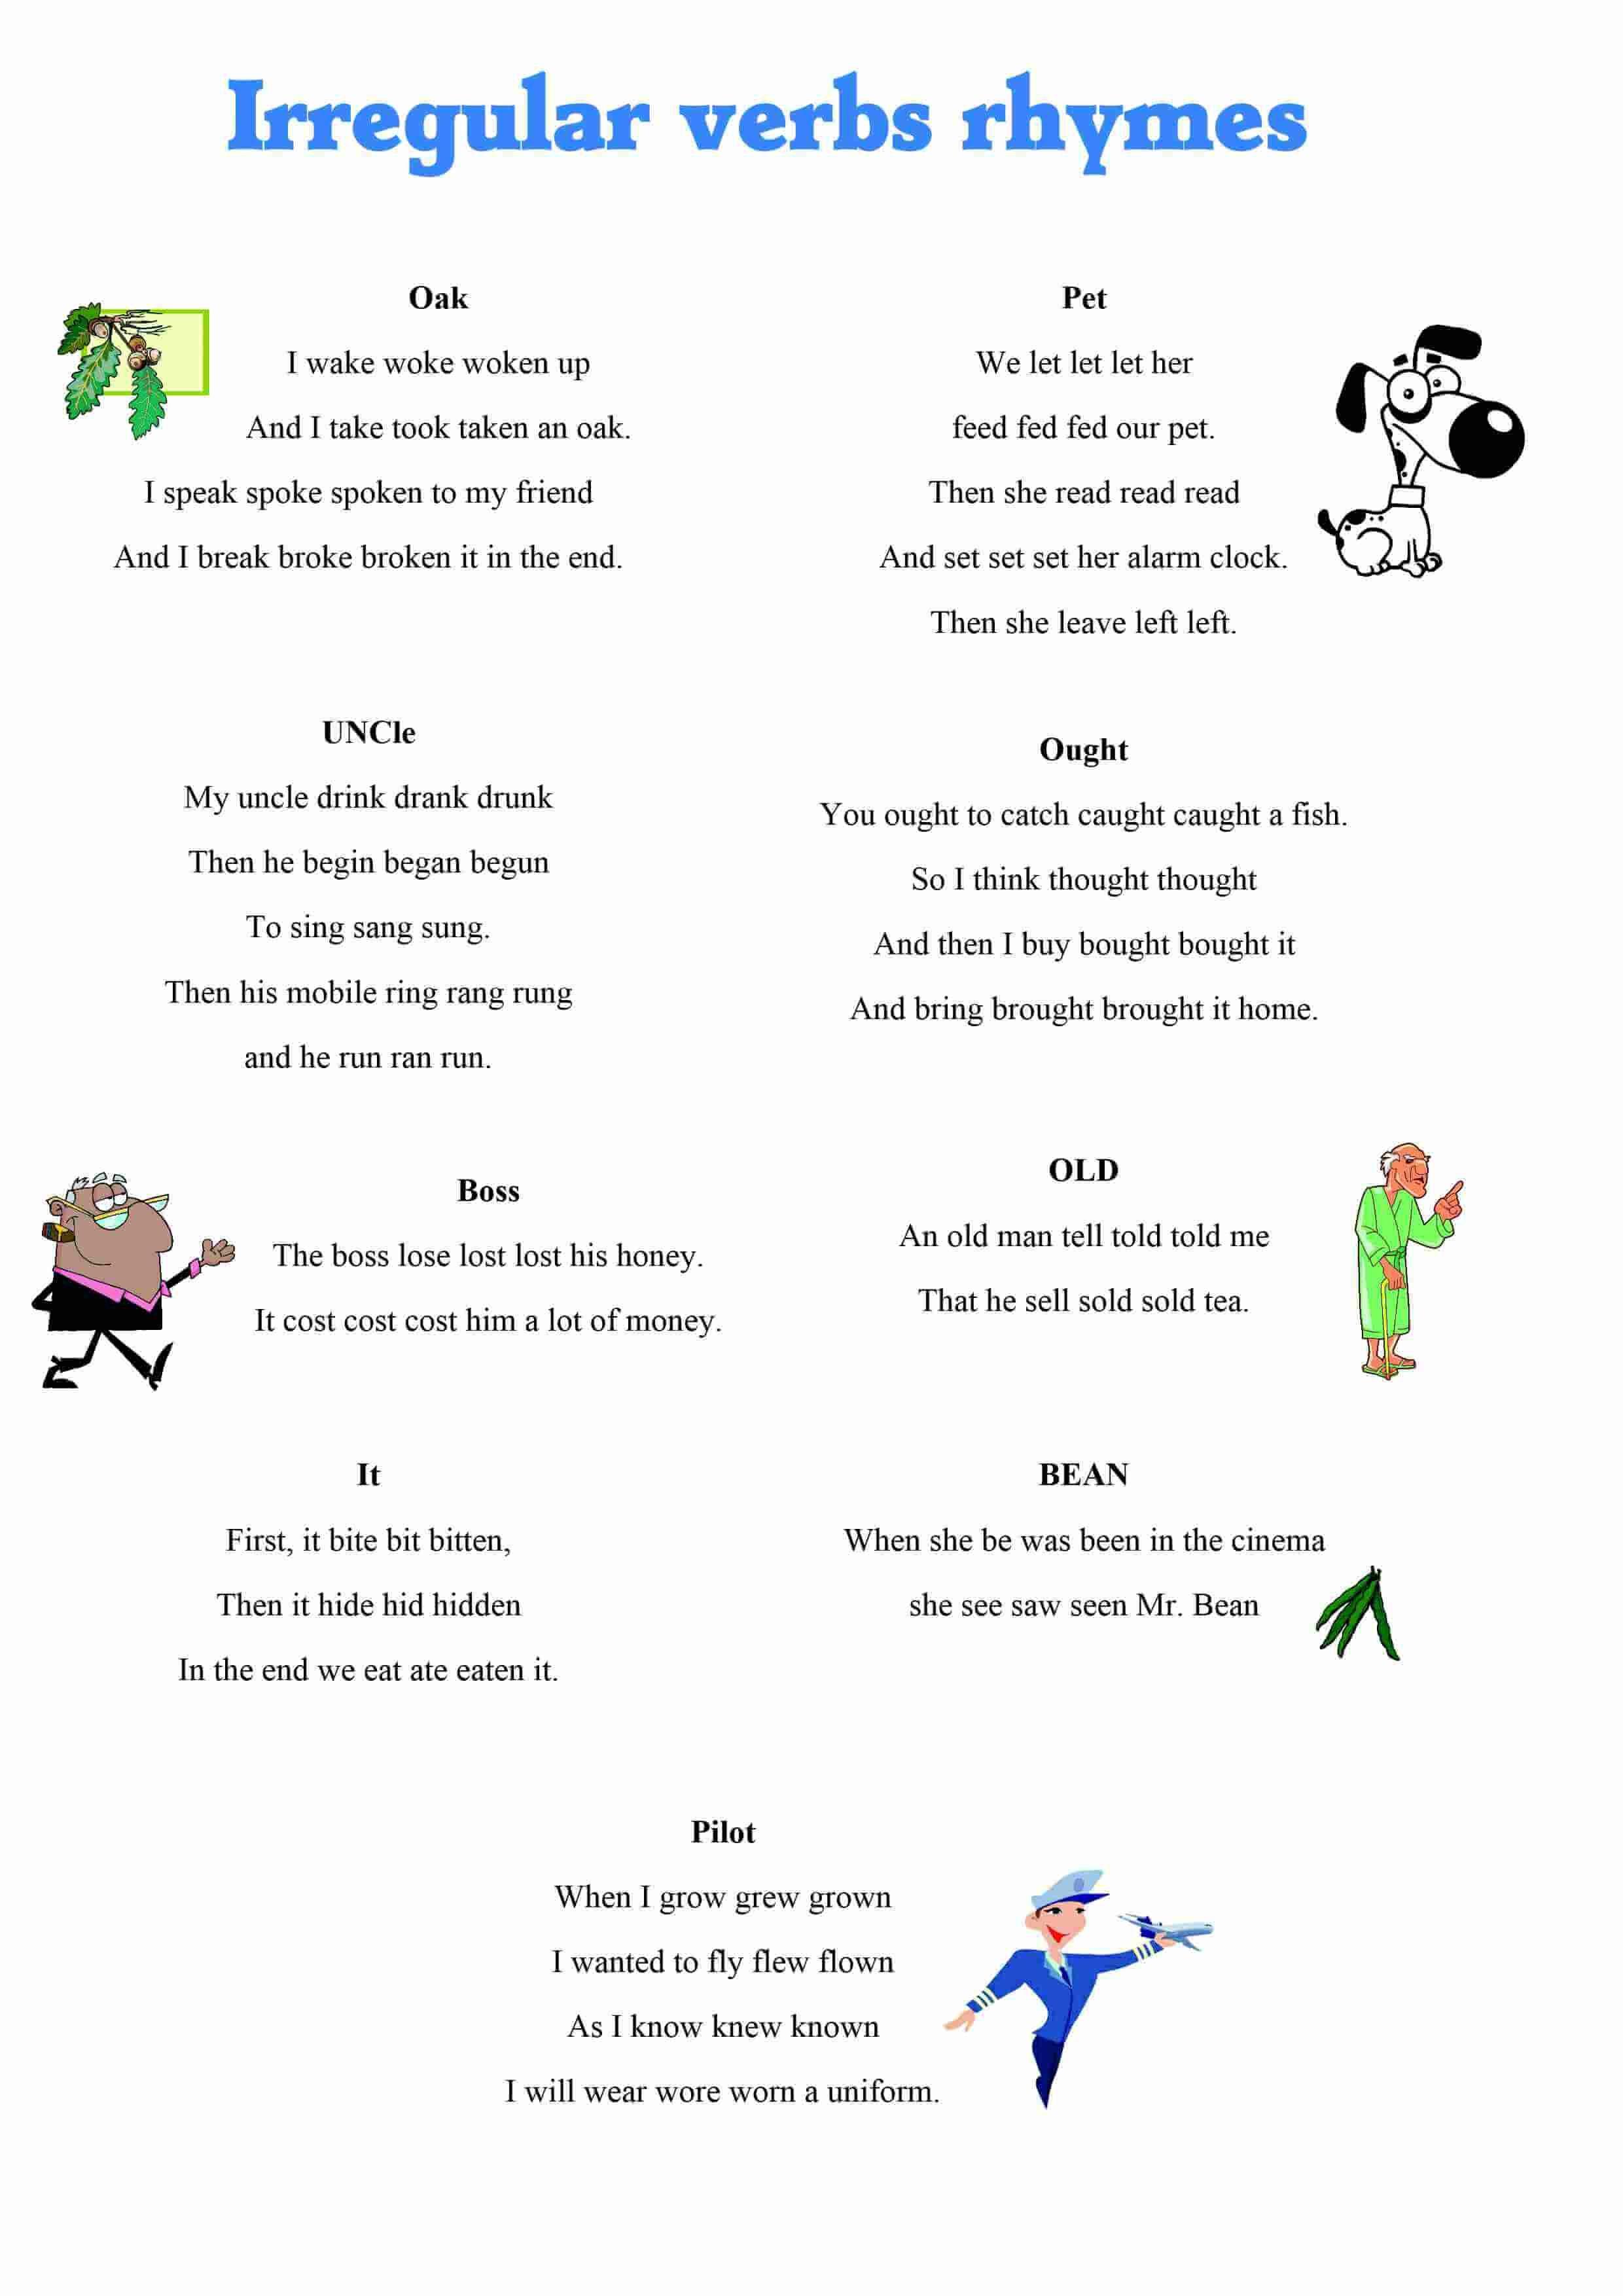 Worksheets Irregular Past Tense Verbs Worksheet simple past regular verbs worksheet on tense worksheet